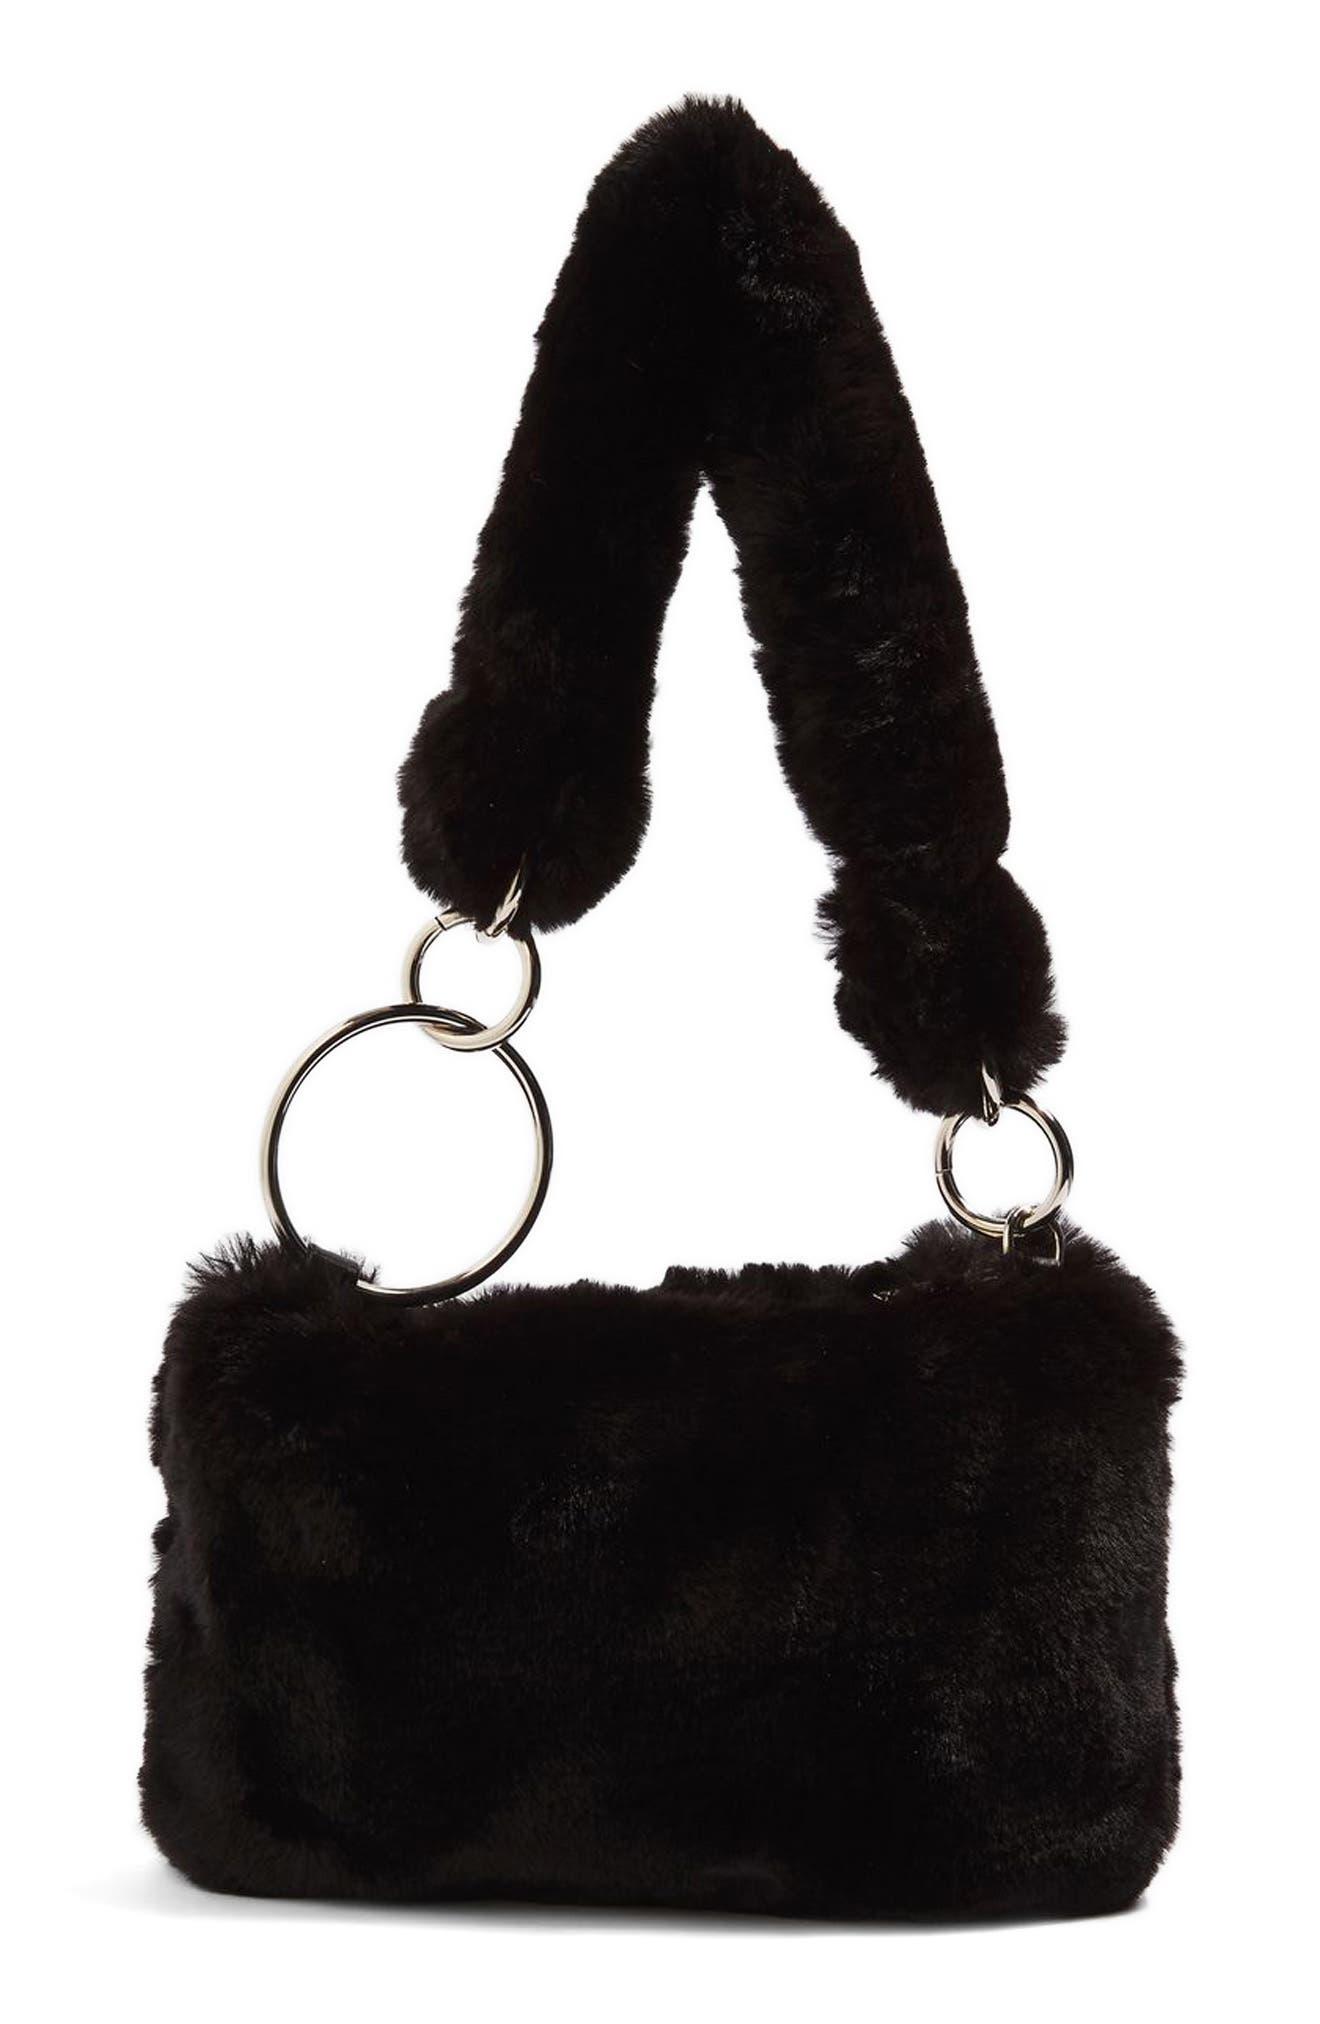 Topshop Teddy Faux Fur Shoulder Bag